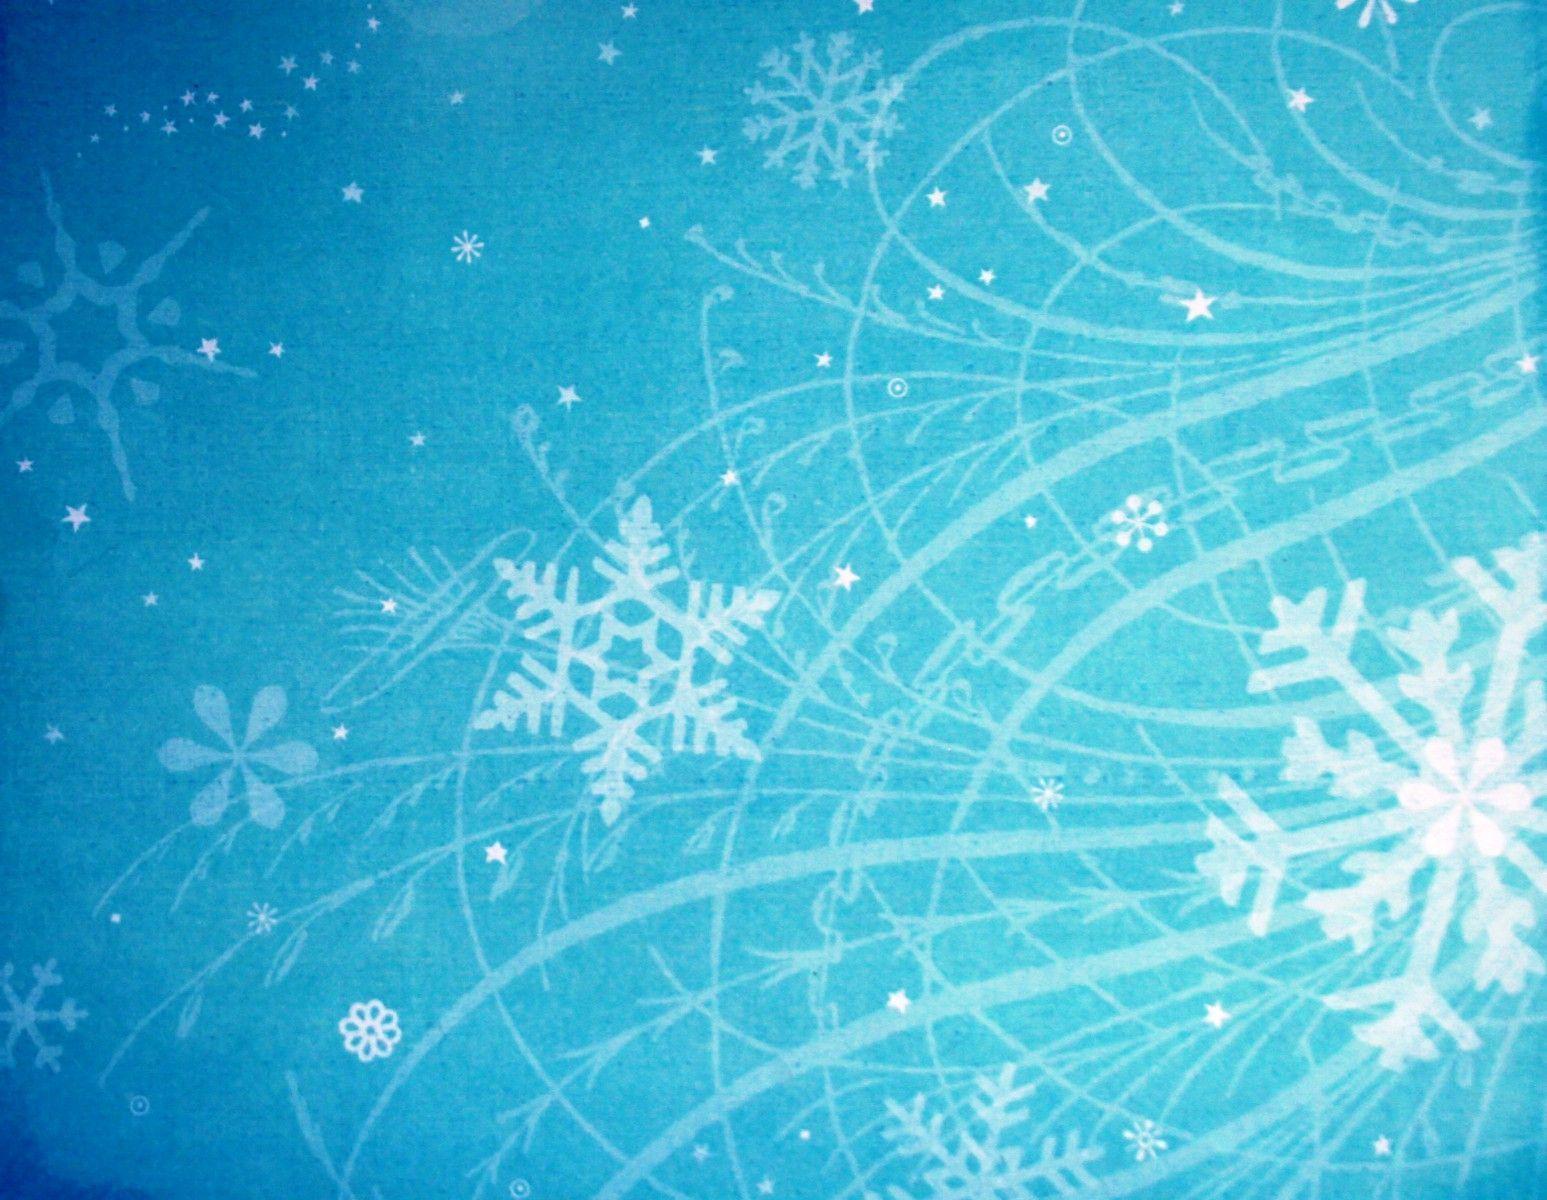 Fall Desktop Wallpaper Illustration Snowflake Wallpaper Hd Pixelstalk Net